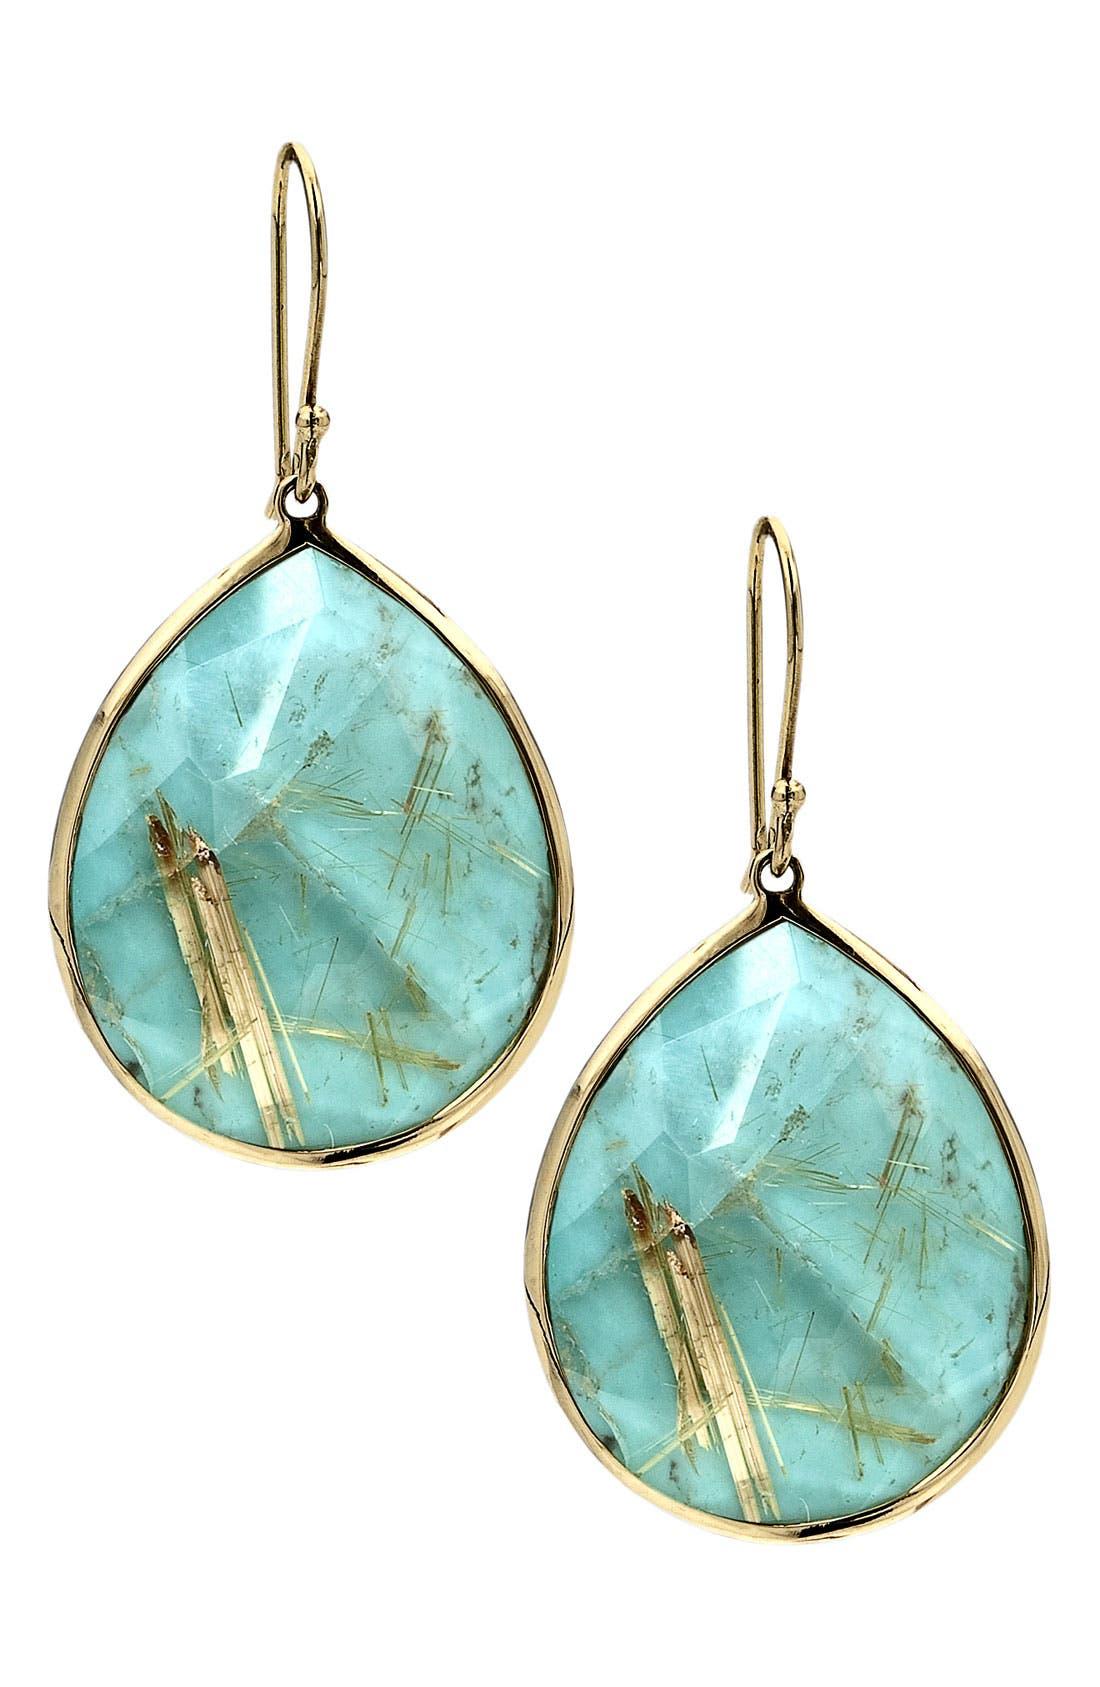 Alternate Image 1 Selected - Ippolita 'Rock Candy - Large Teardrop' 18k Gold Earrings